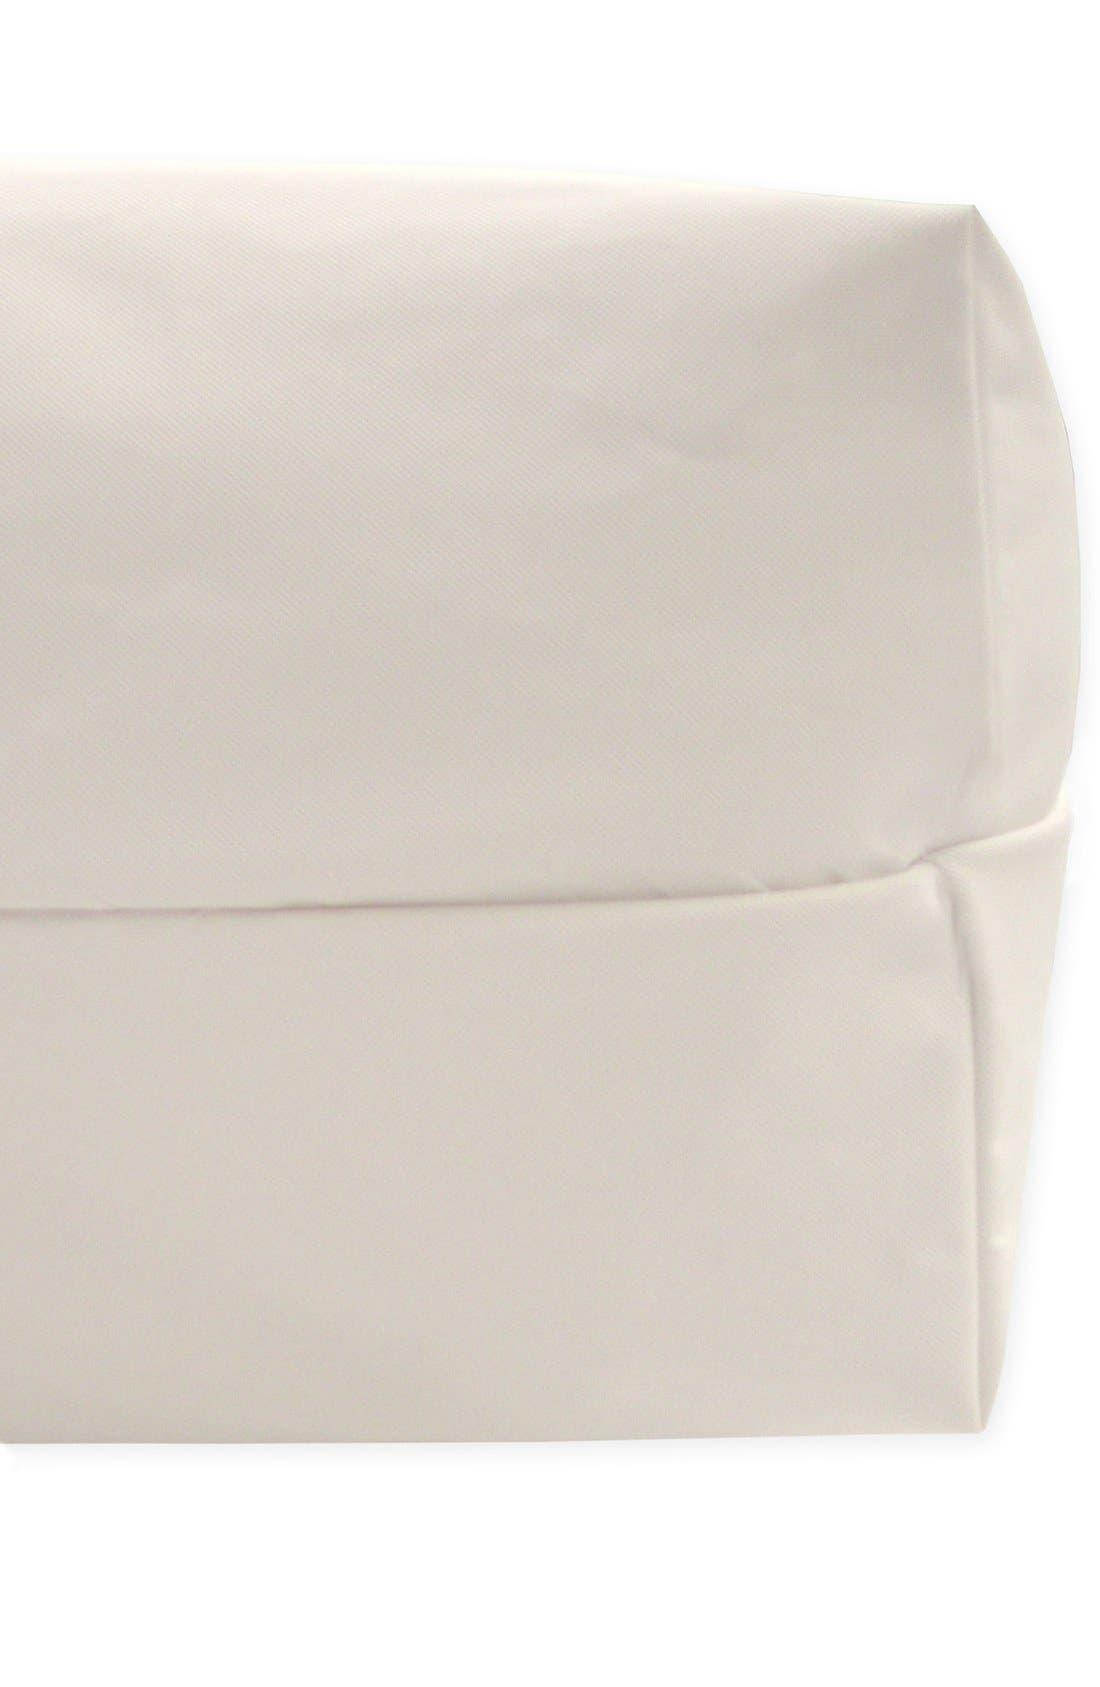 Lightweight Organic Cotton Classic 2-Stage Crib Mattress,                             Alternate thumbnail 2, color,                             White